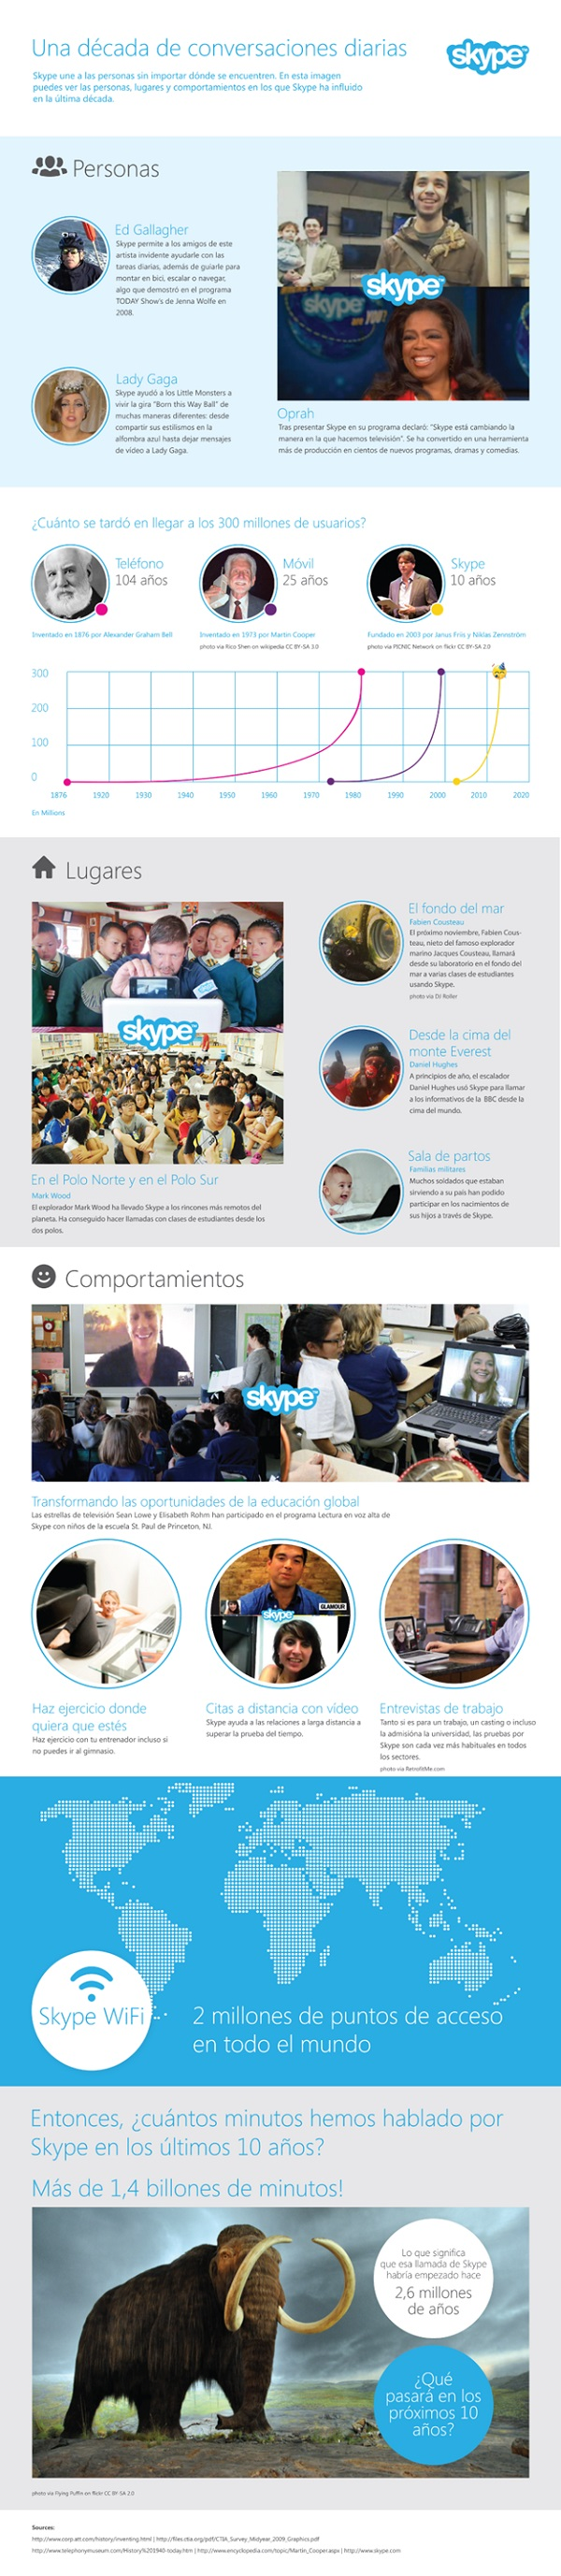 Skype 10 años